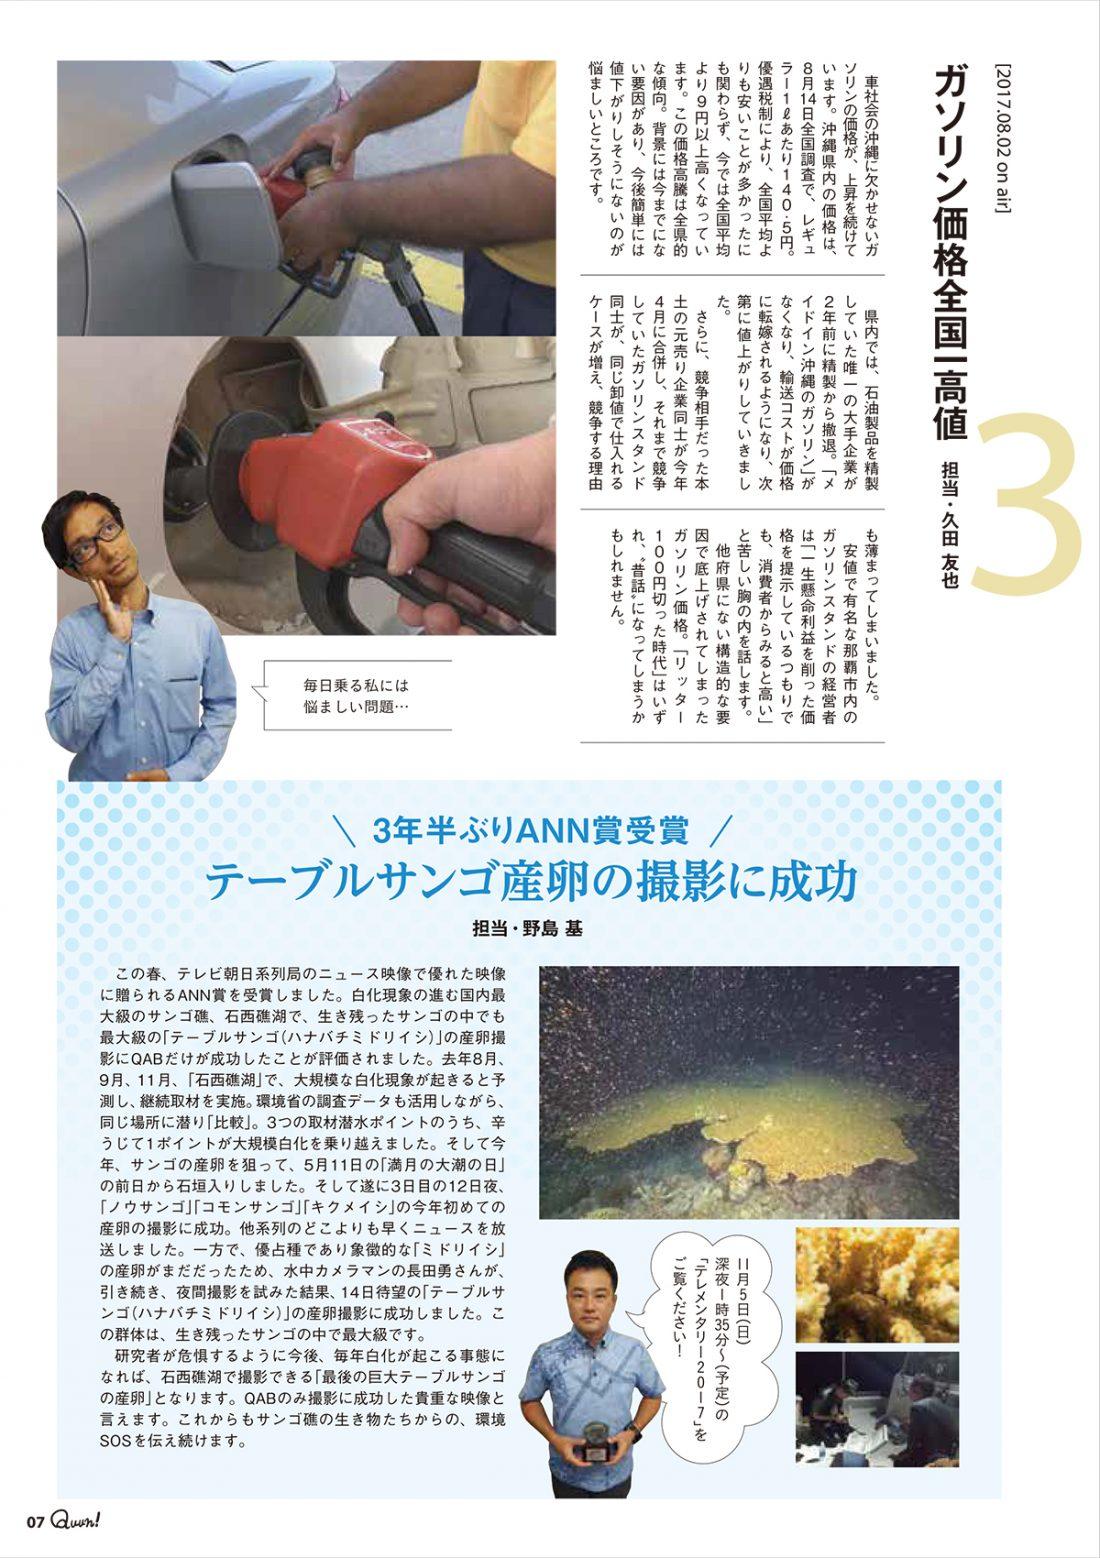 http://www.qab.co.jp/qgoro/wp-content/uploads/quun_0809-1100x1558.jpg